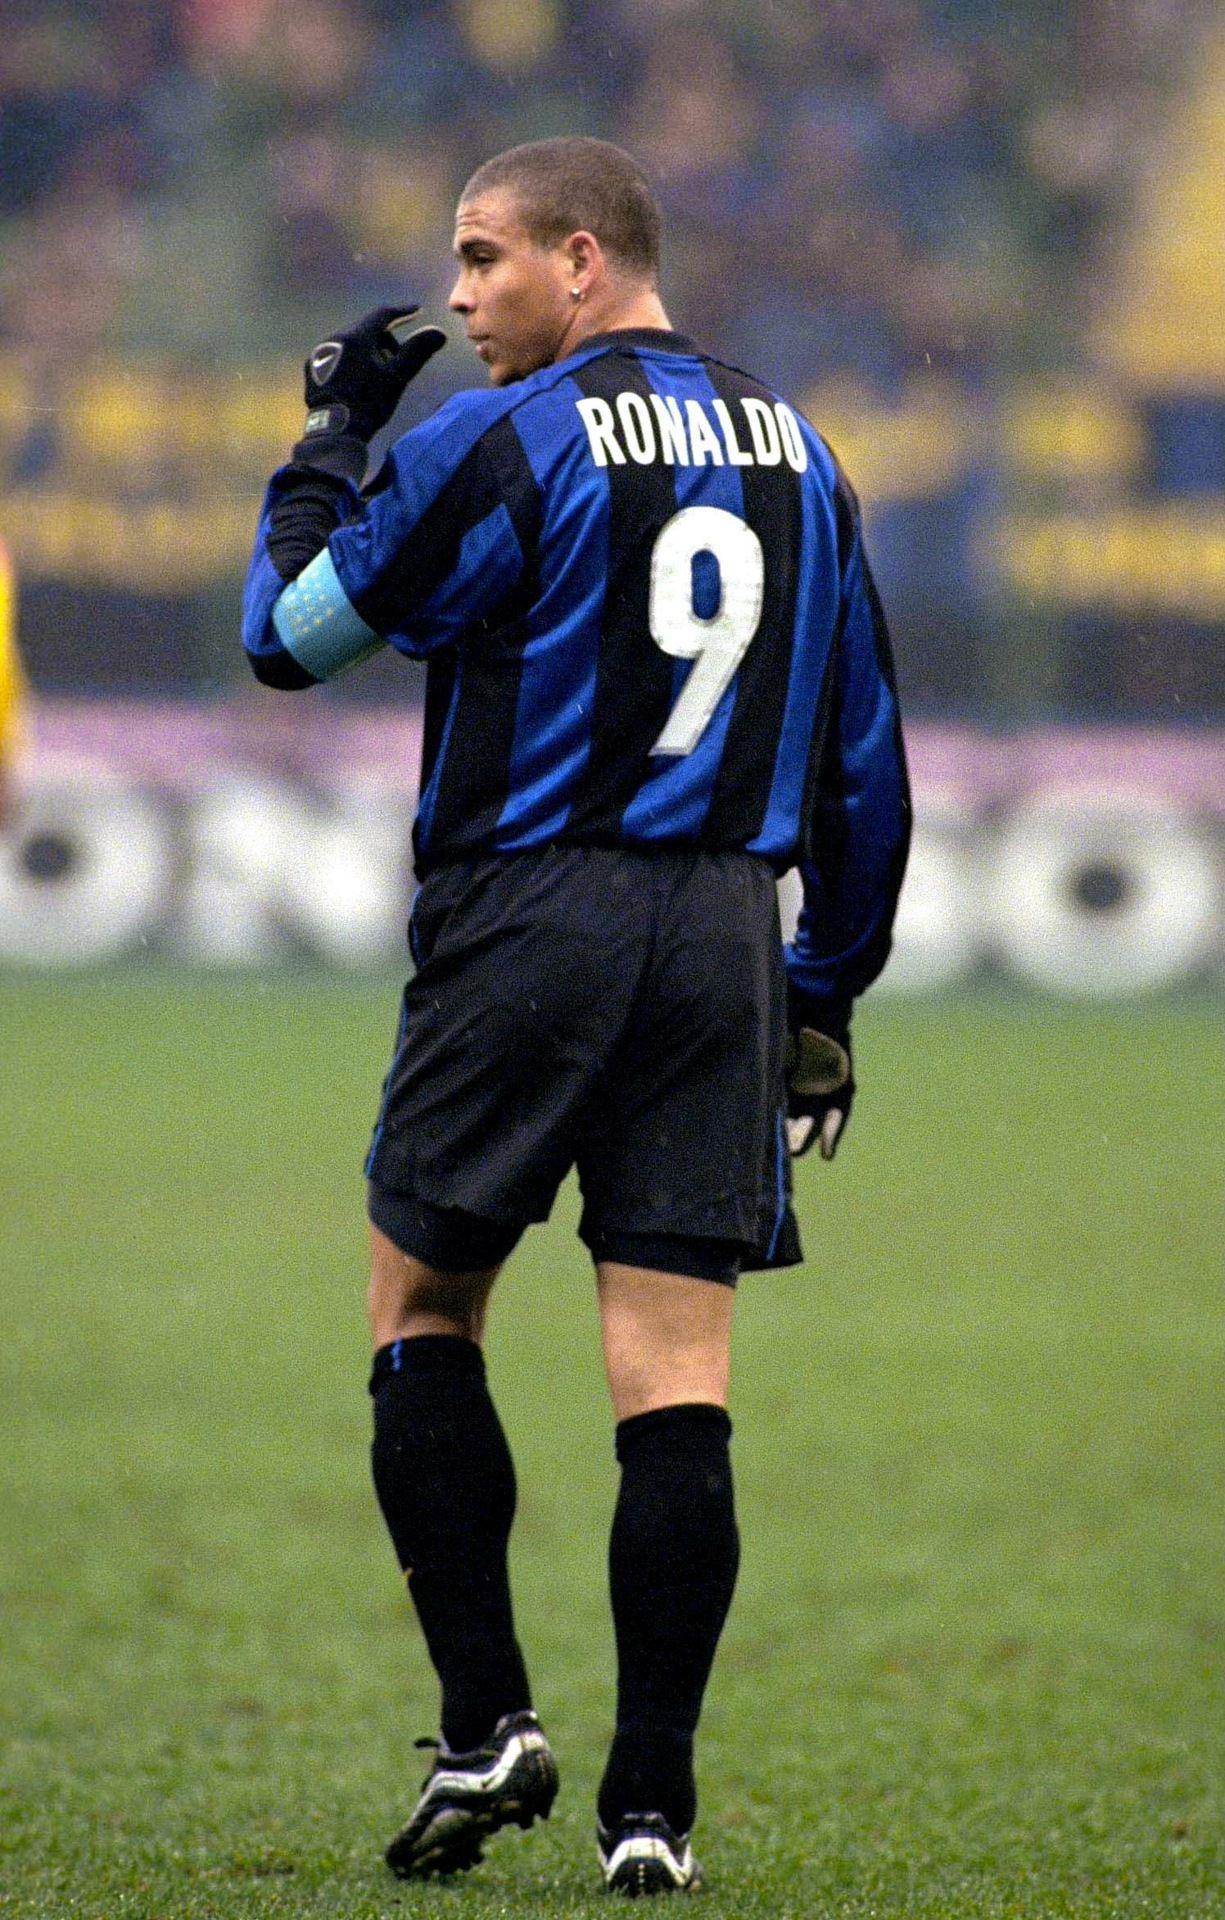 ronaldo inter.jpg